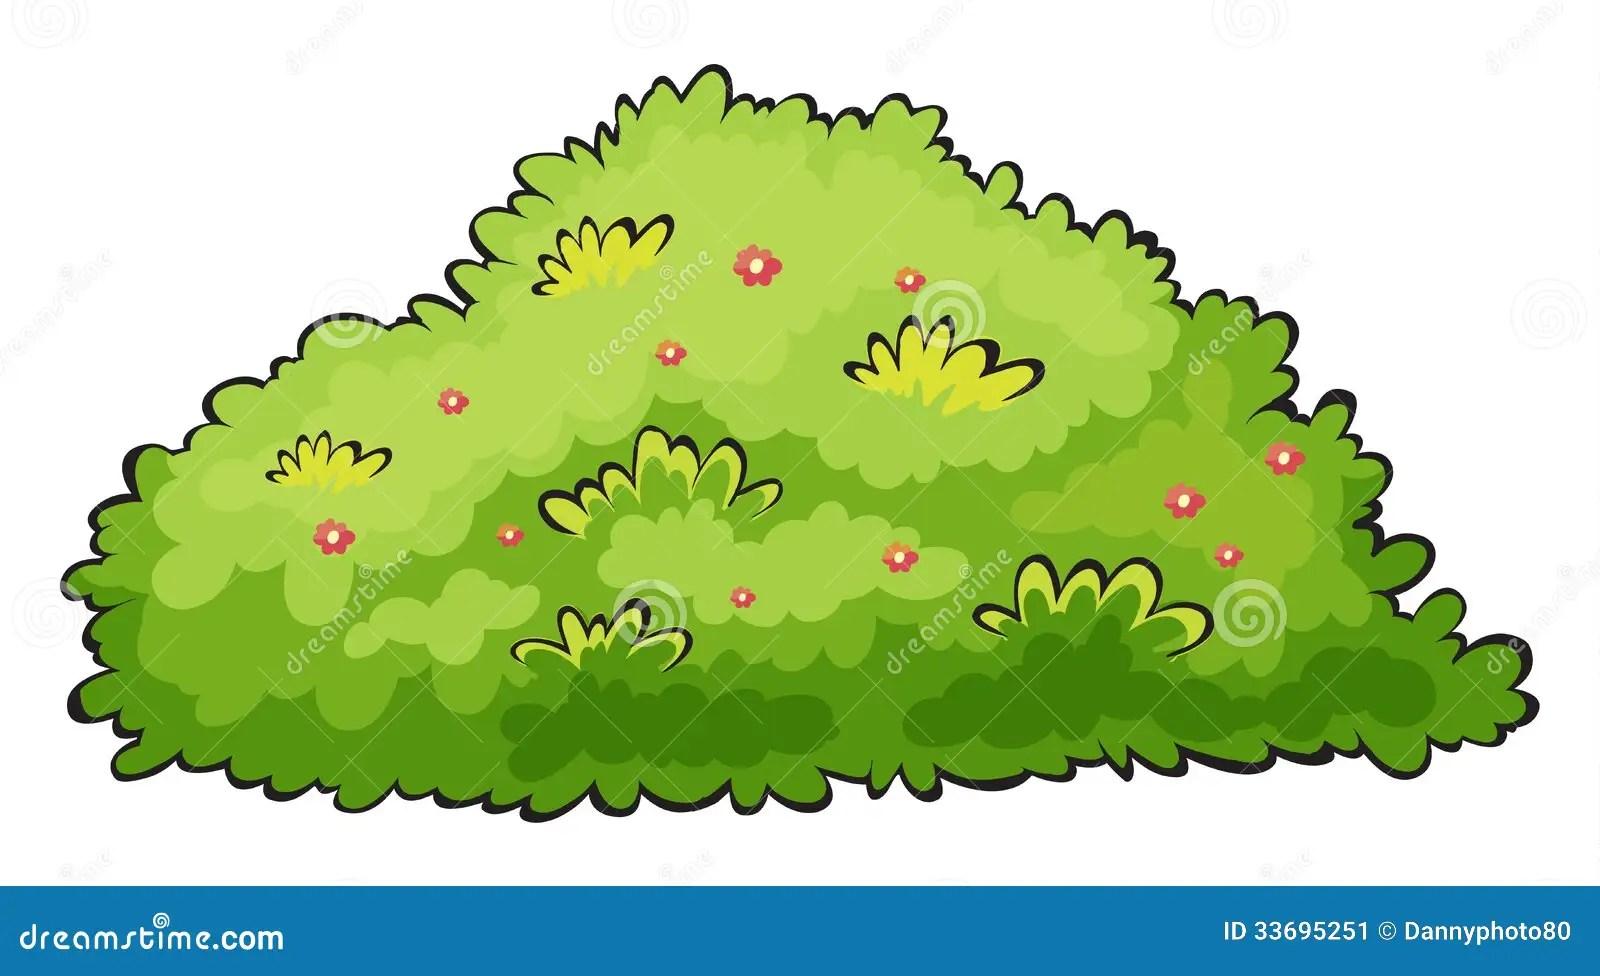 Green Bush Stock Vector. Illustration Of Art, Bush, Black